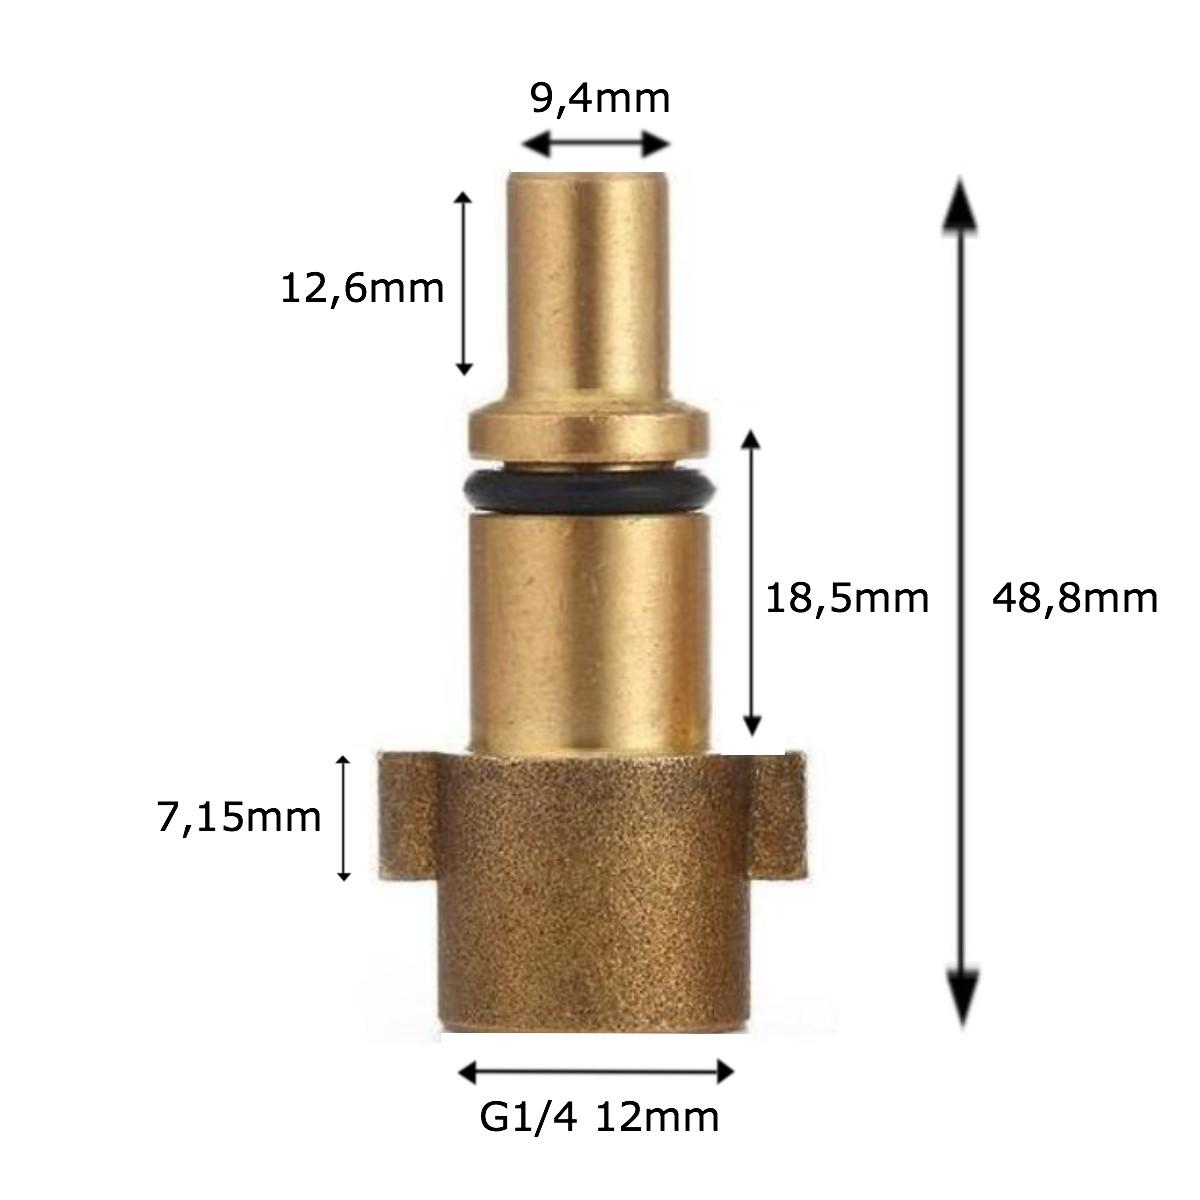 Conector Engate Rápido p/ Snow Foam Wap Mandala Detailer 1/4